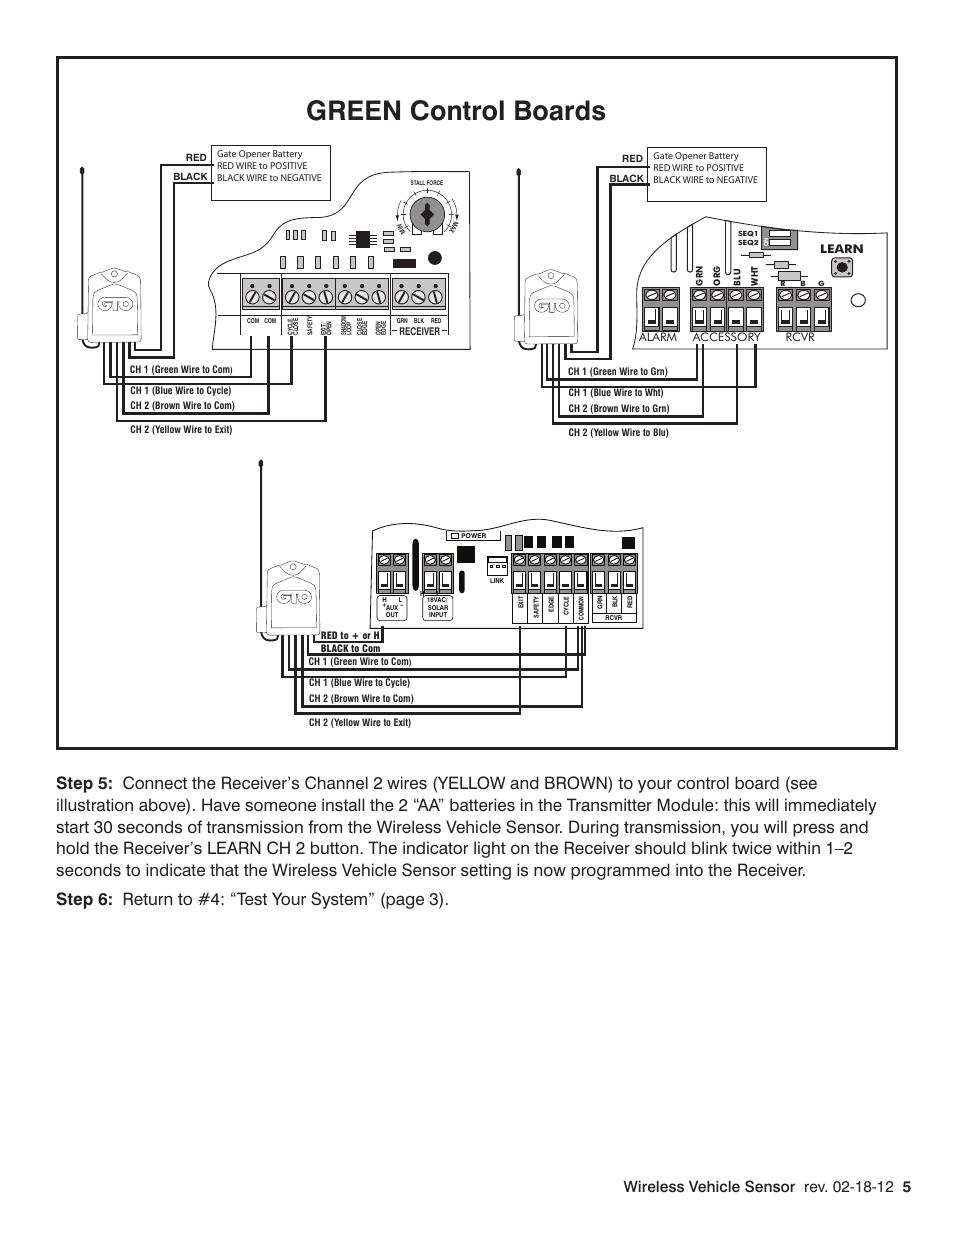 Green Control Boards Learn Mighty Mule Fm130 User Manual